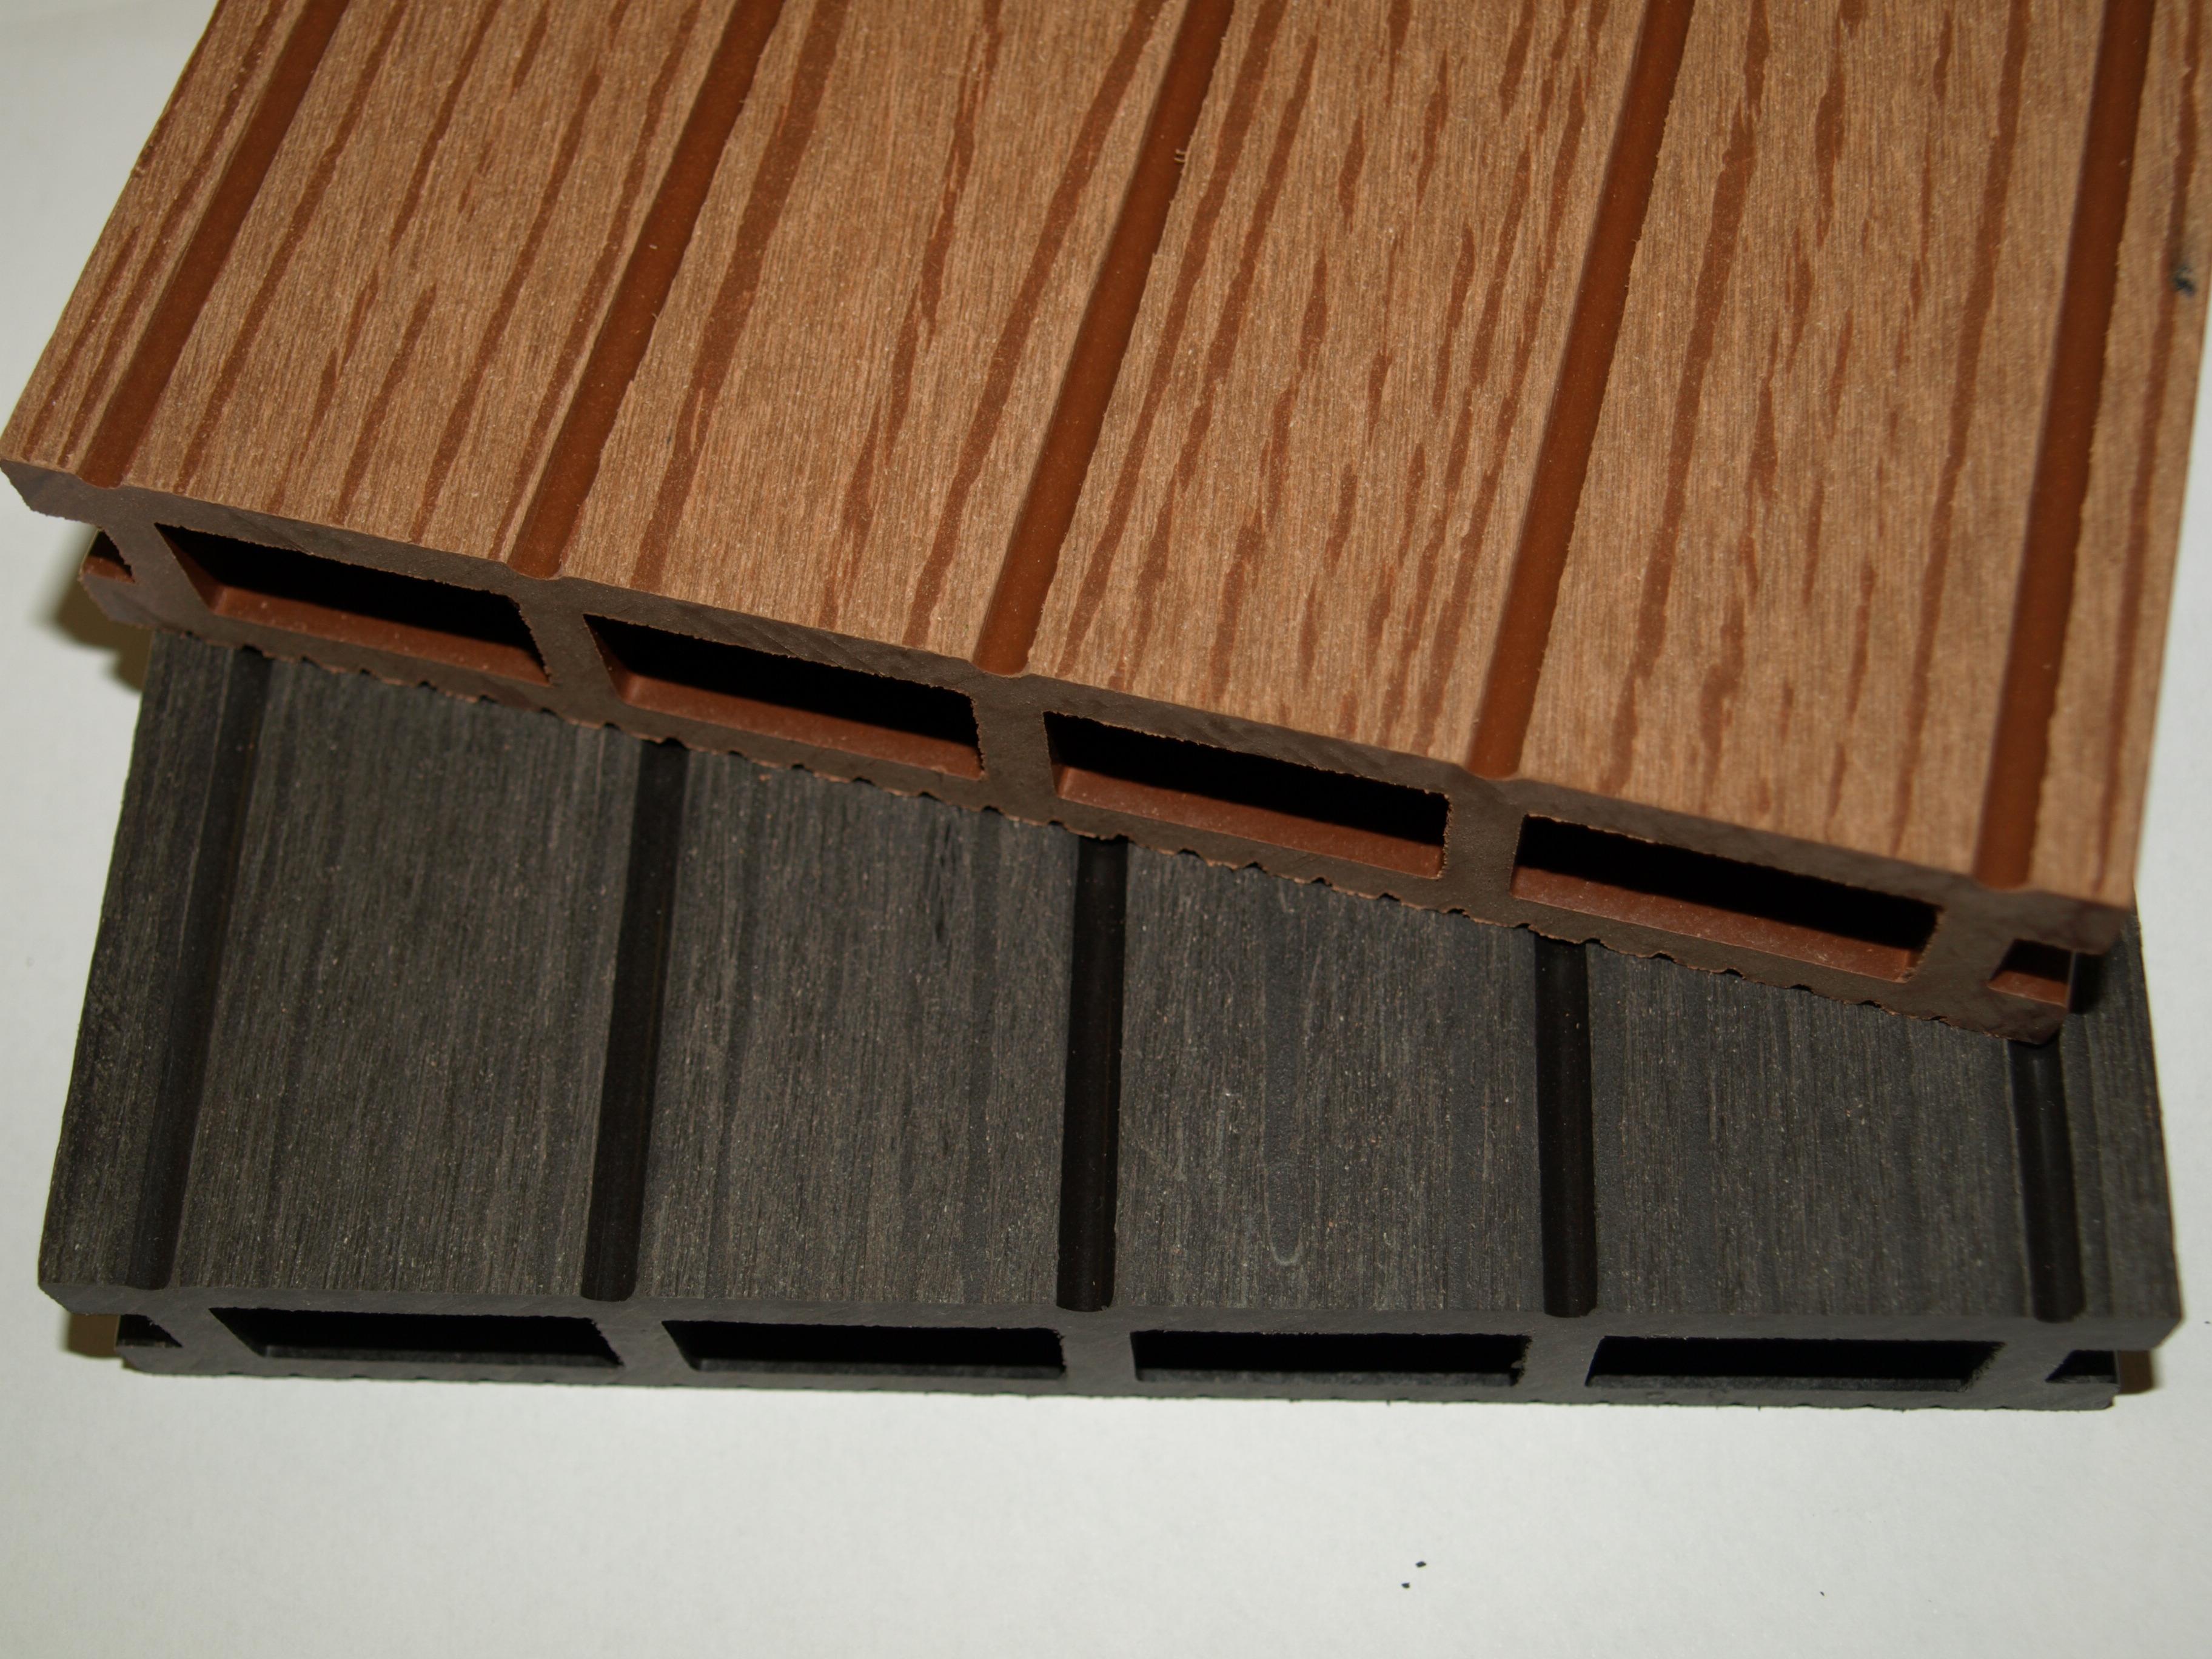 plastic wood material has the advantages of both plant fibers and plastics